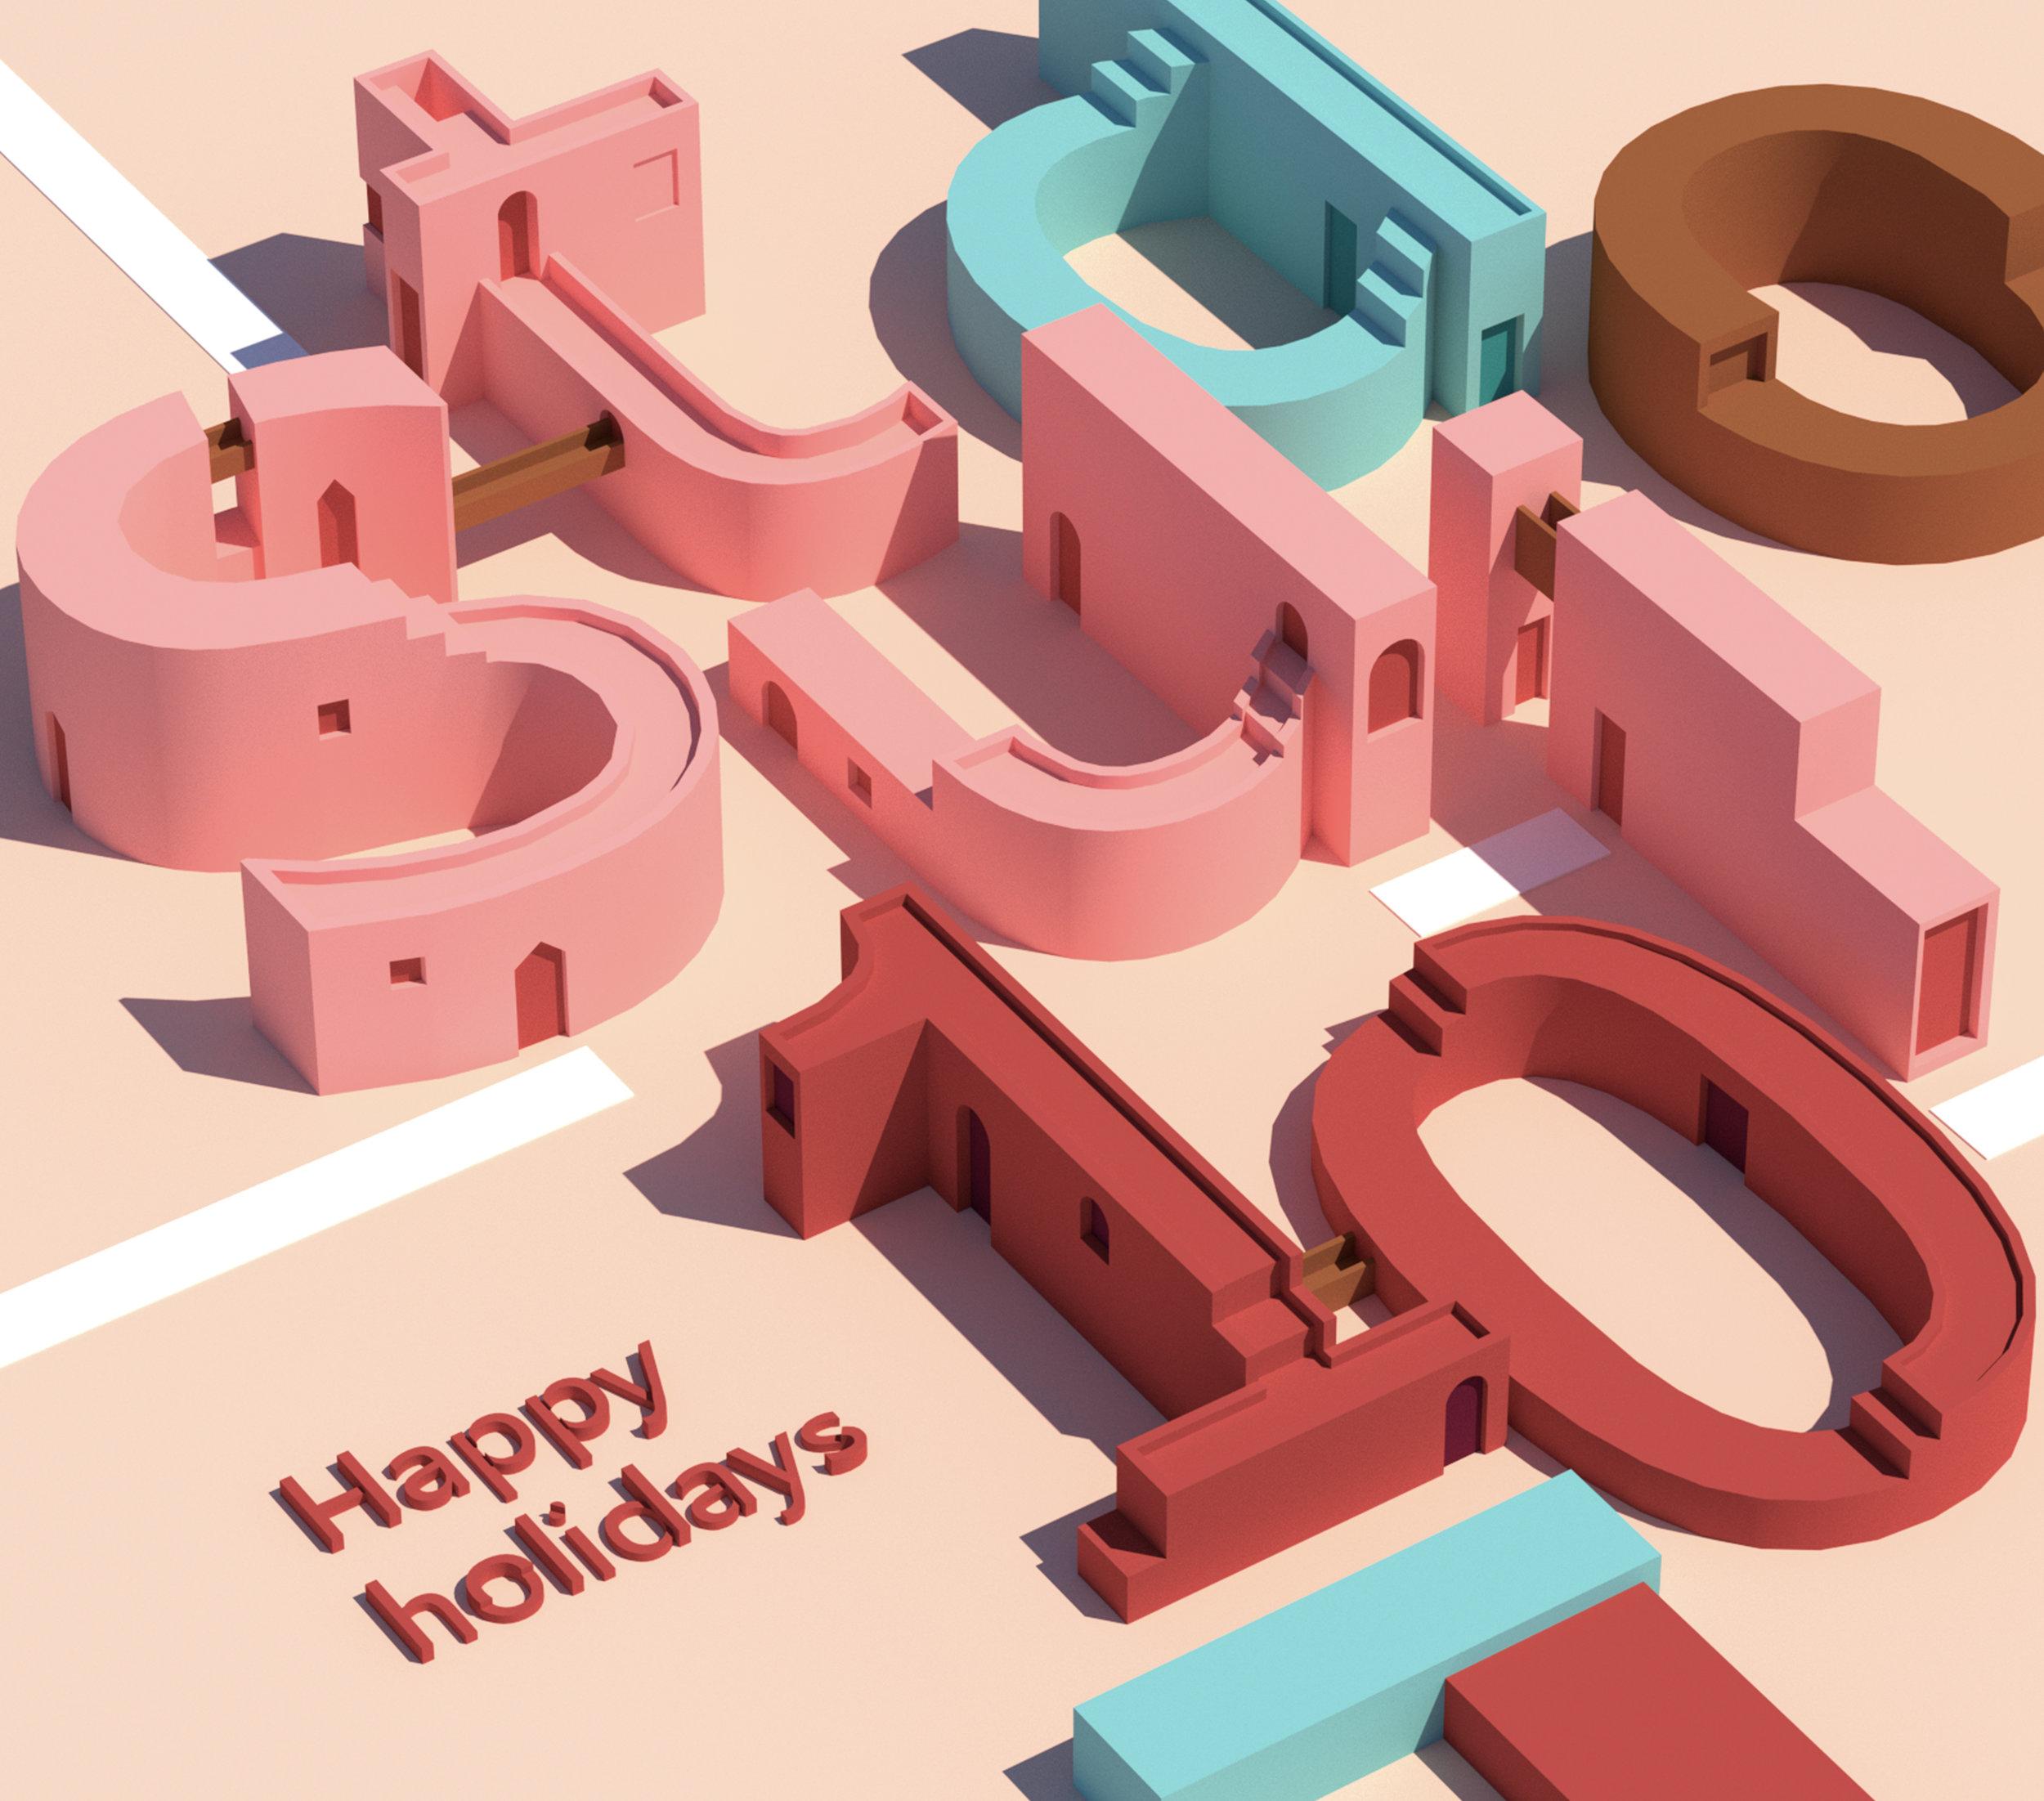 holiday card by Chunhui.jpeg